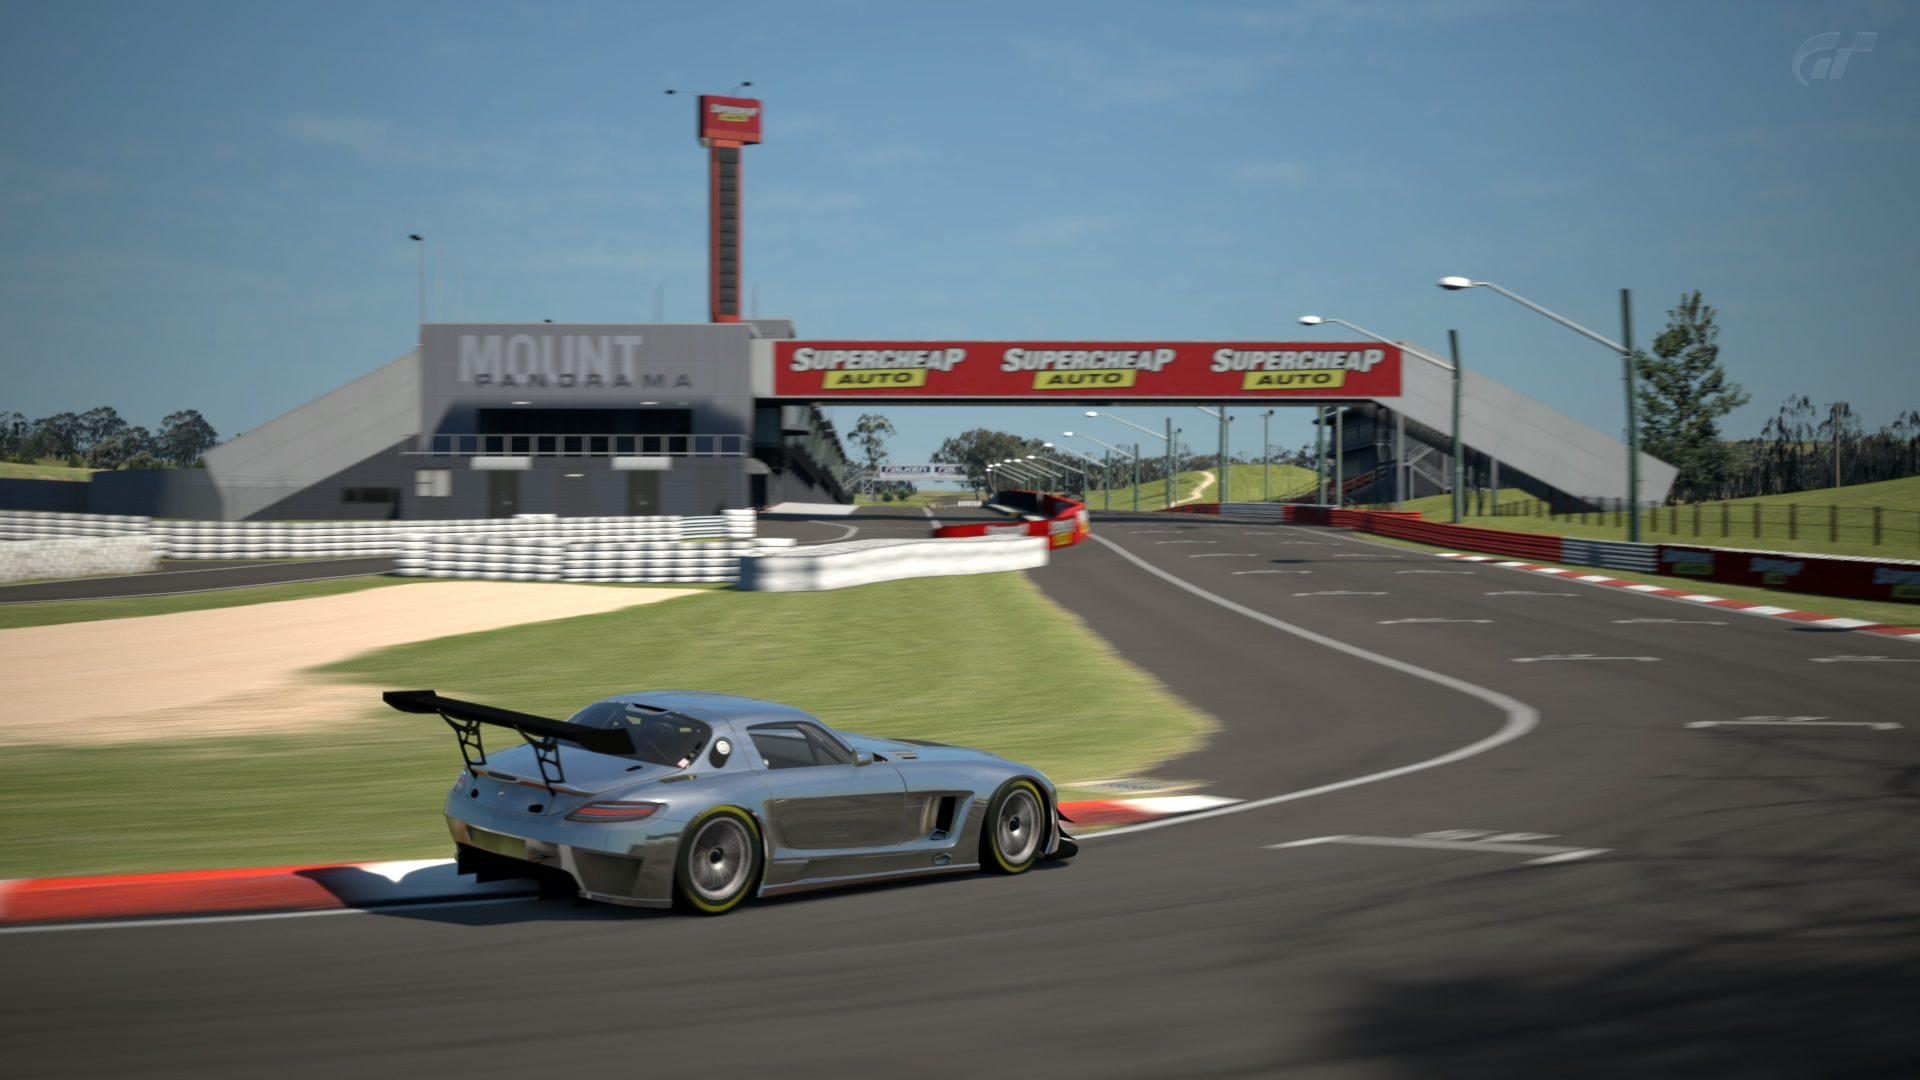 Mount Panorama Motor Racing Circuit_1 (3).jpg